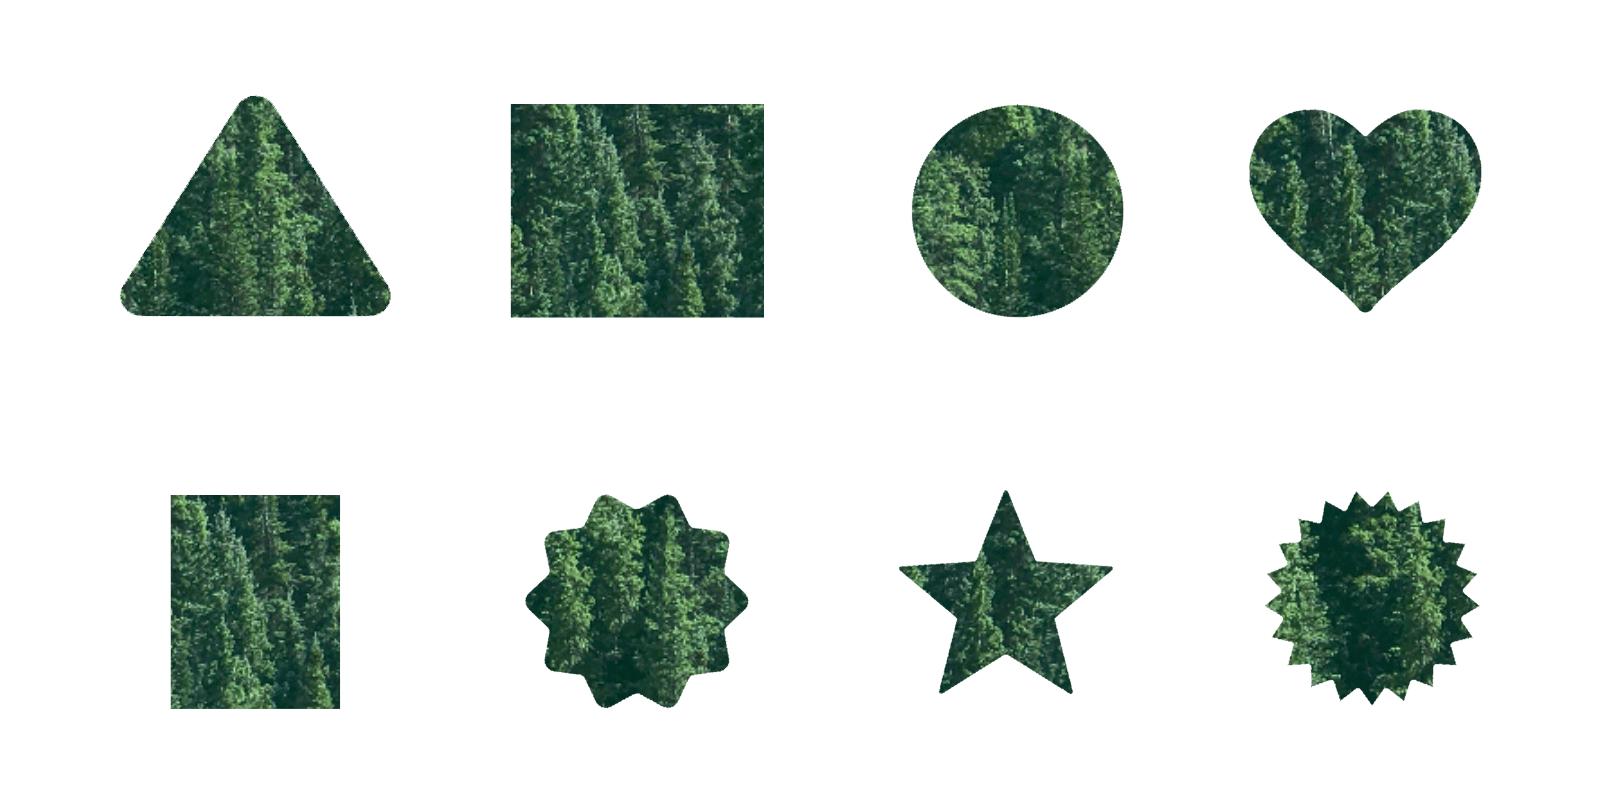 Crop shapes